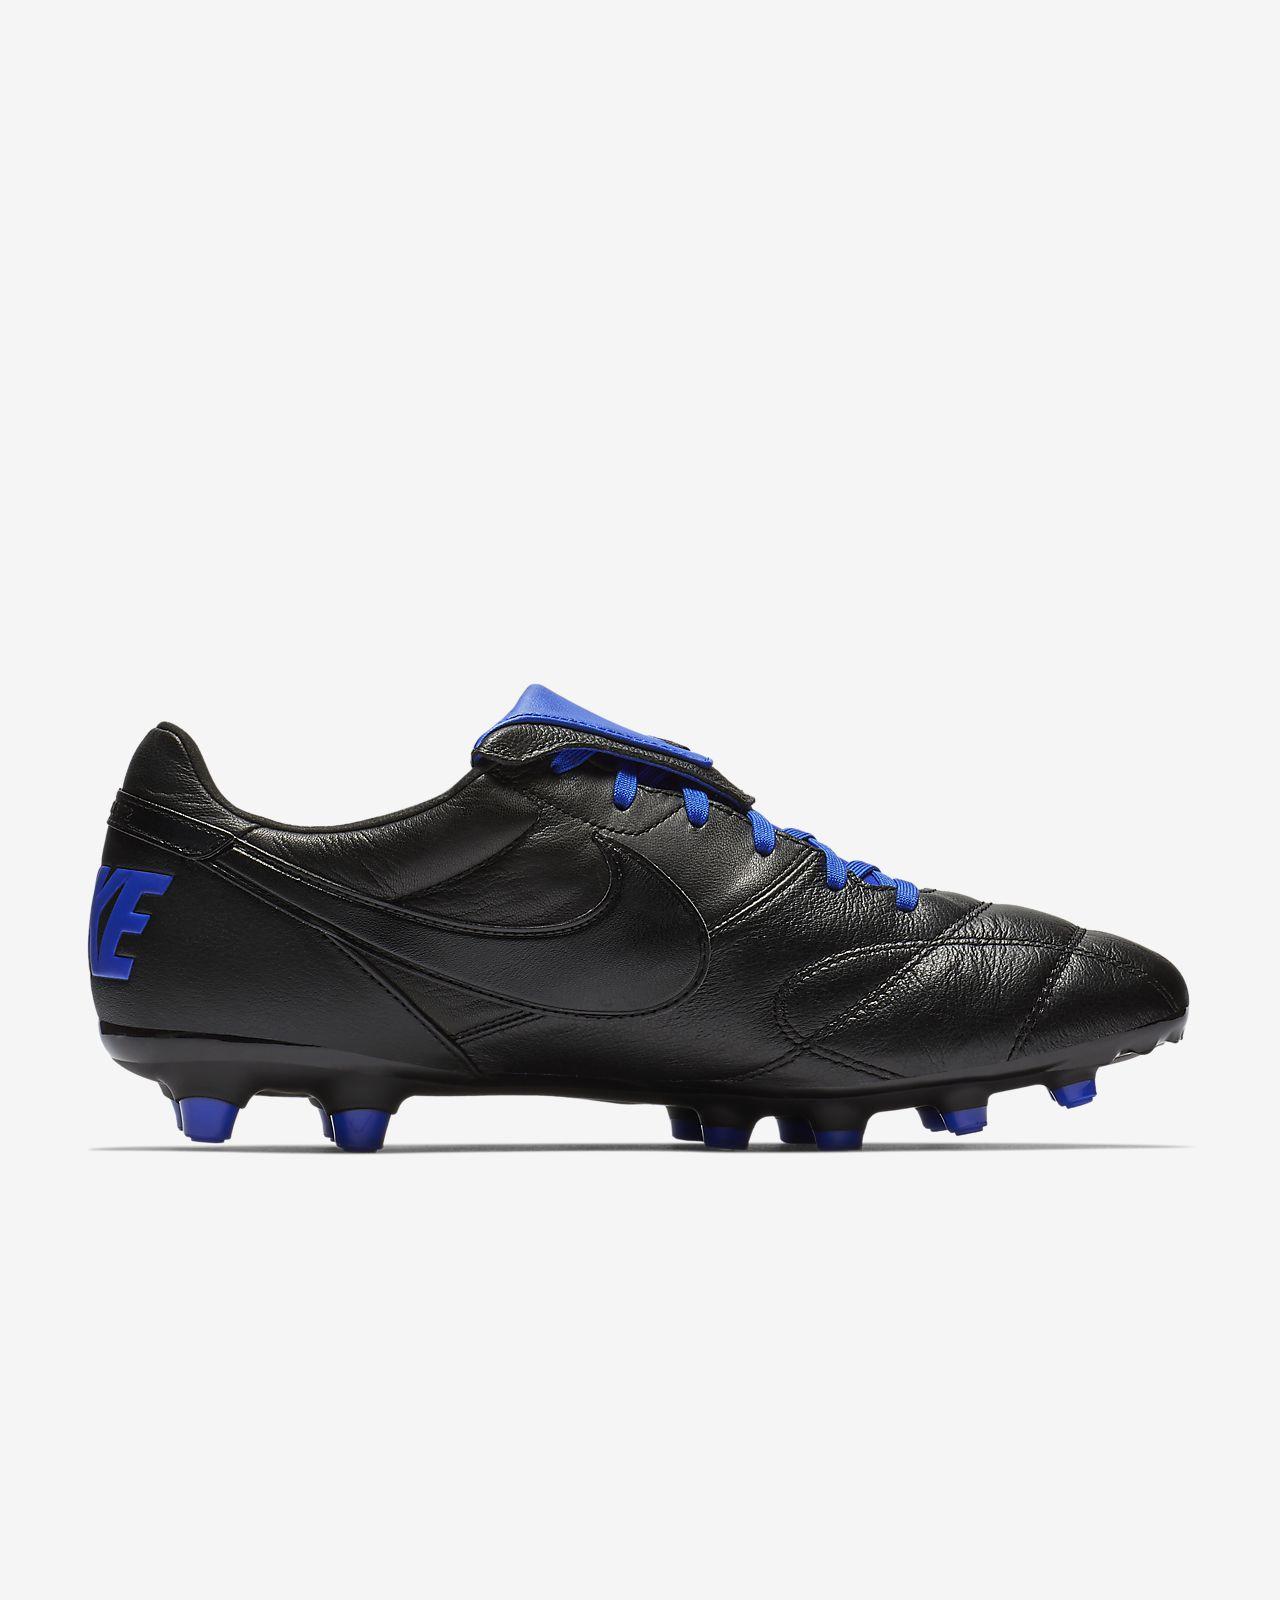 b6e6919b562 Nike Premier II FG Firm-Ground Football Boot. Nike.com ID